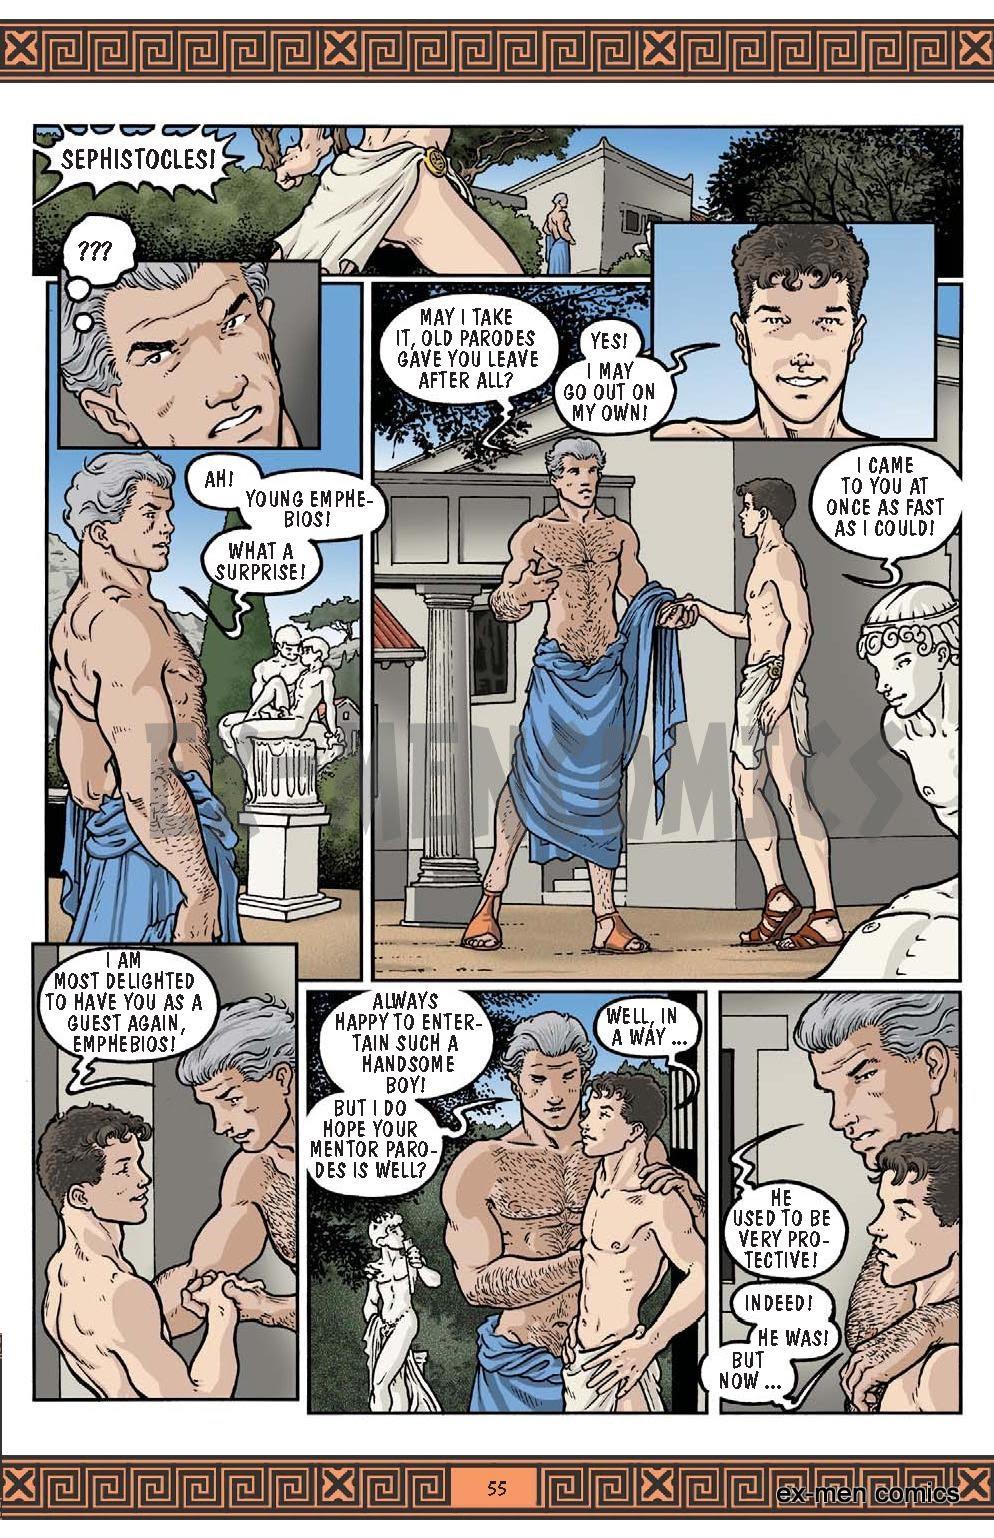 Roman themed porn